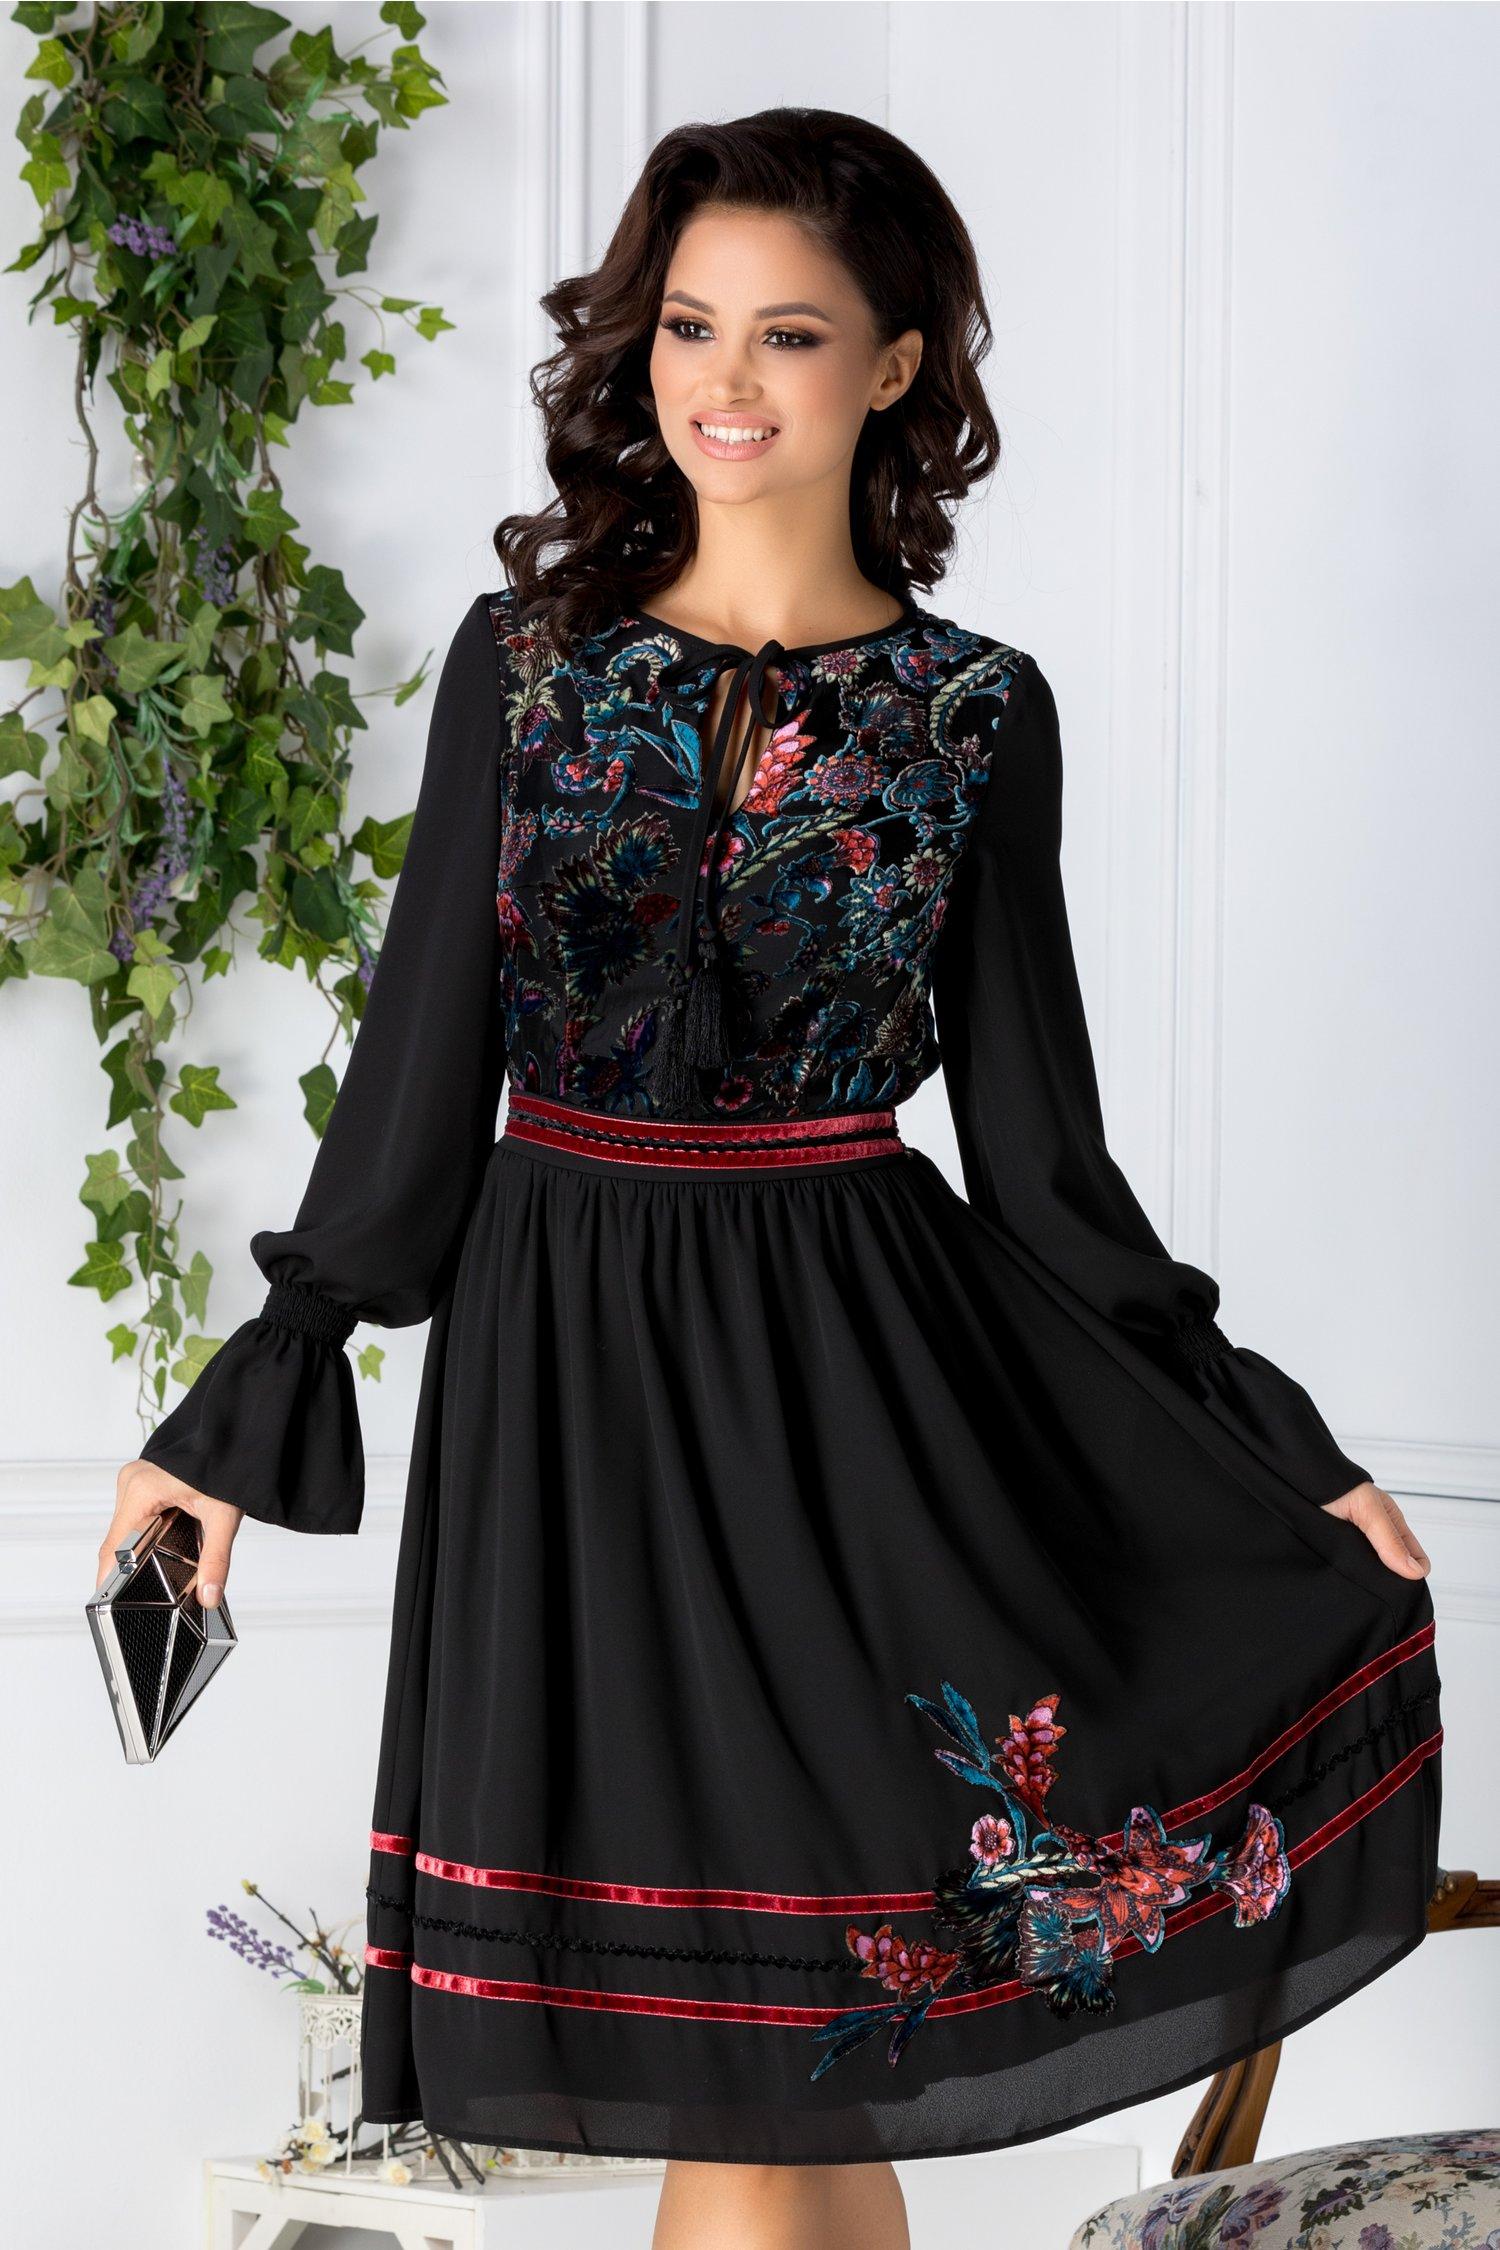 Rochie Paty neagra cu motive florale catifelate colorate